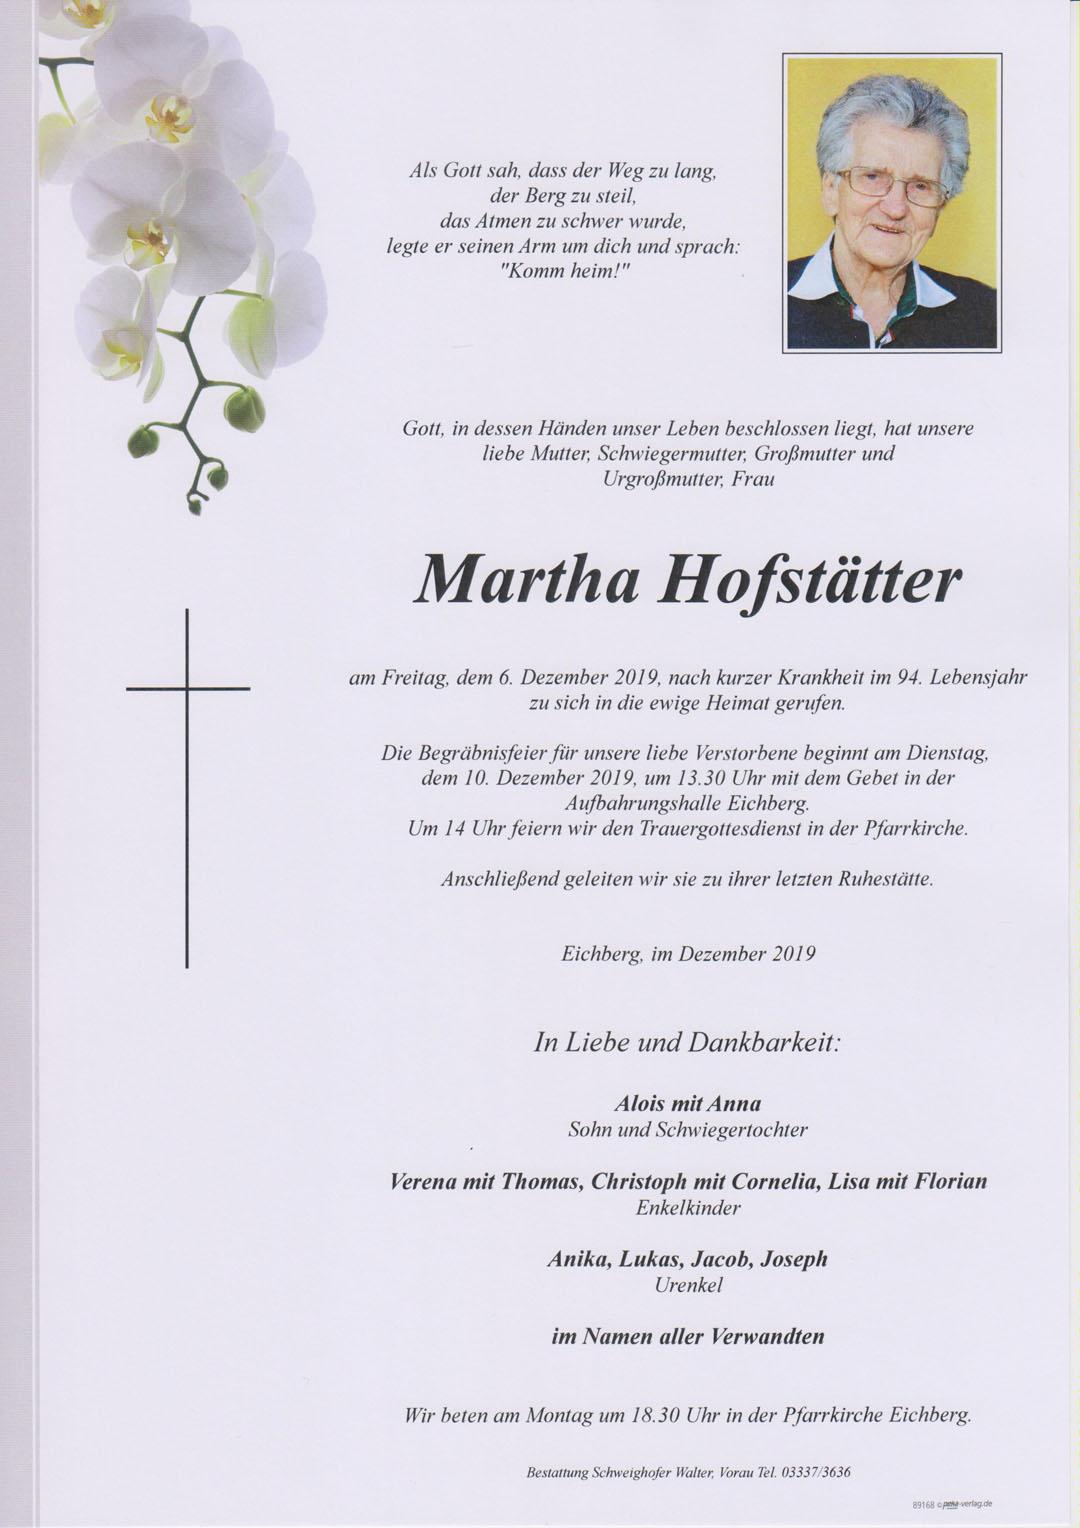 Martha Hofstätter